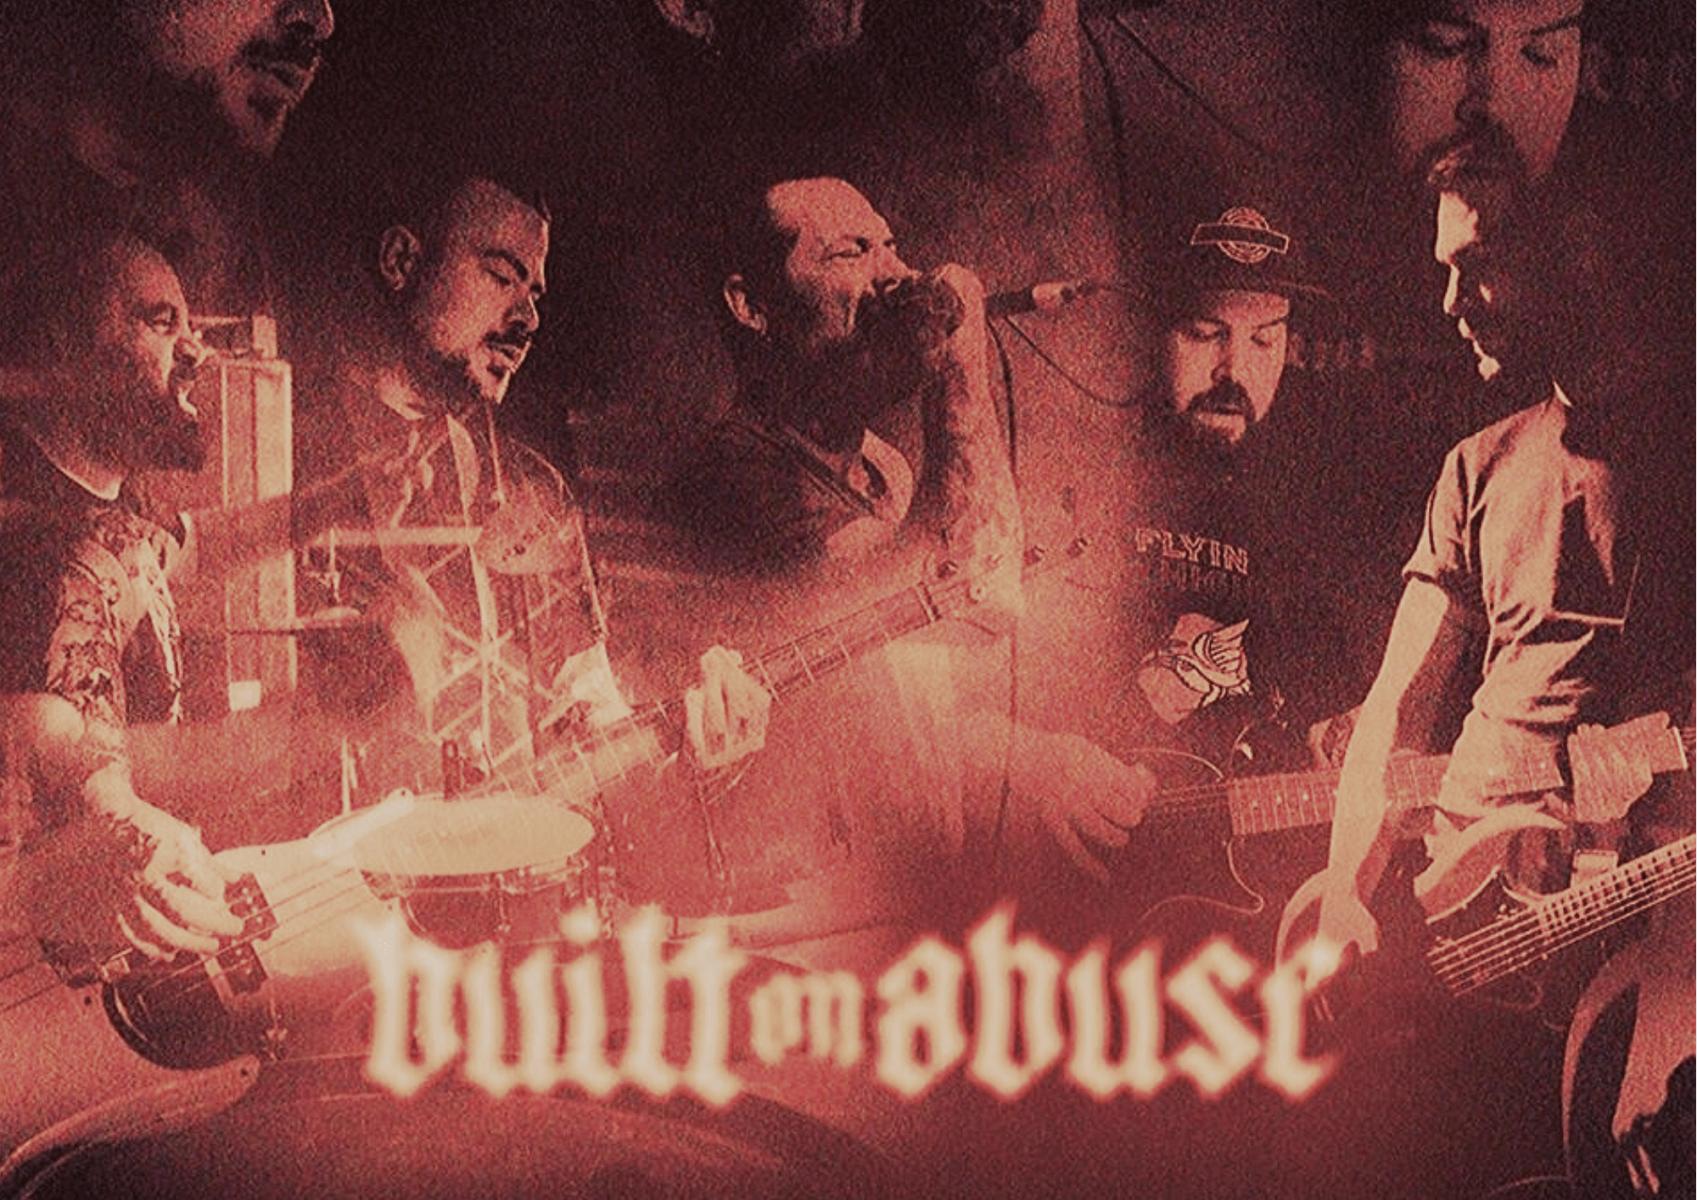 built to abuse - alla my ghosts - singolo - 2020 - sa scena sarda